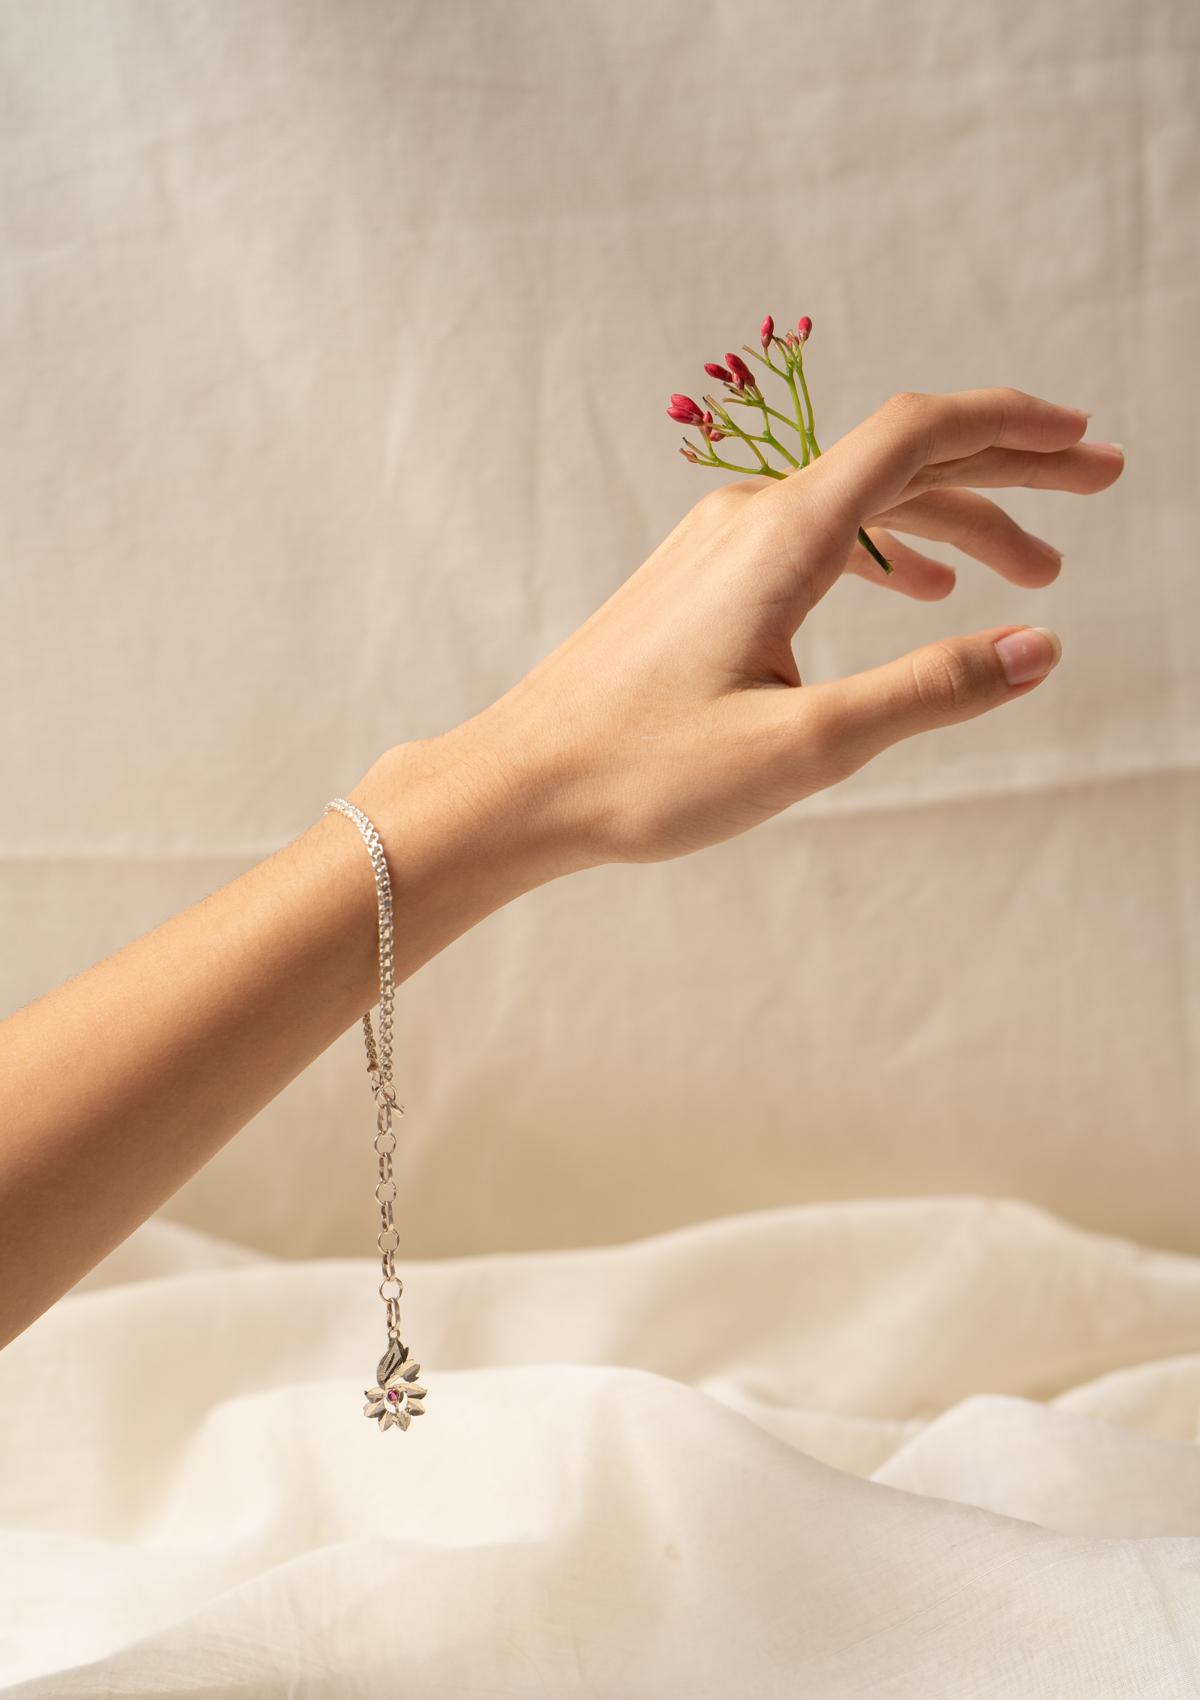 Reshu Silver Bracelet